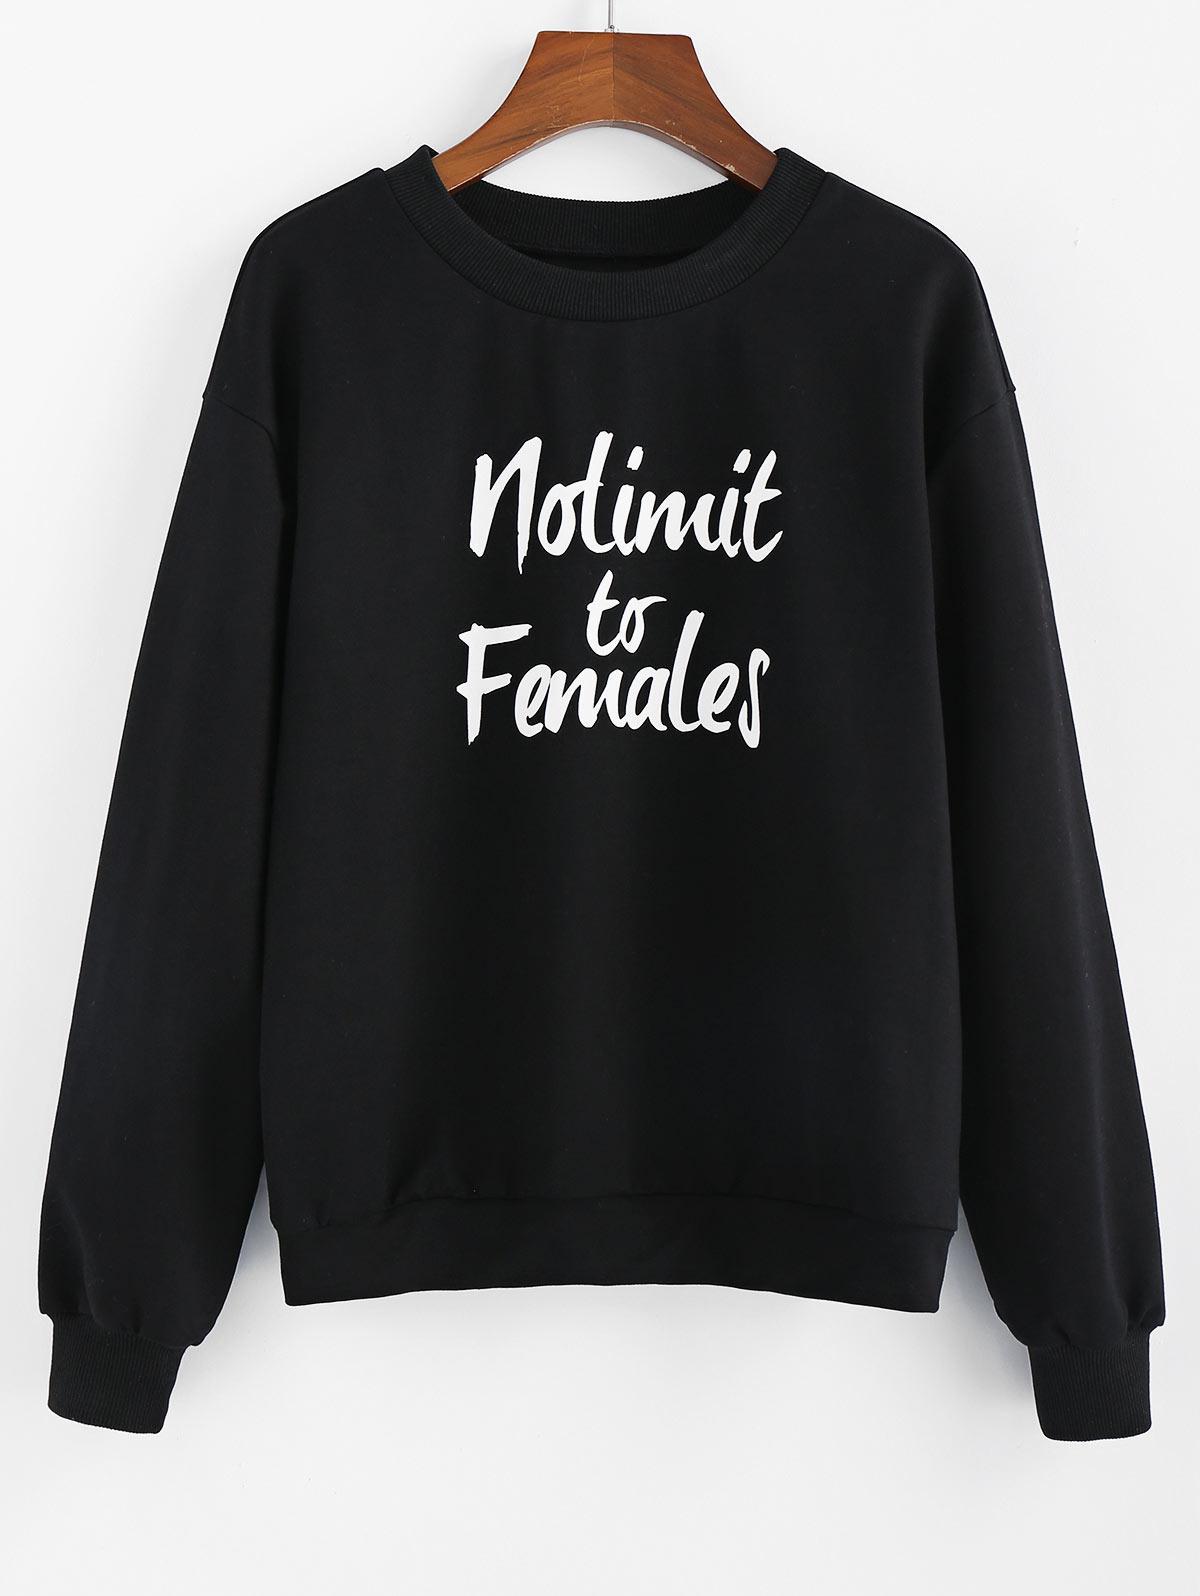 ZAFUL Nolimit to Females Graphic Drop Shoulder Lounge Sweatshirt